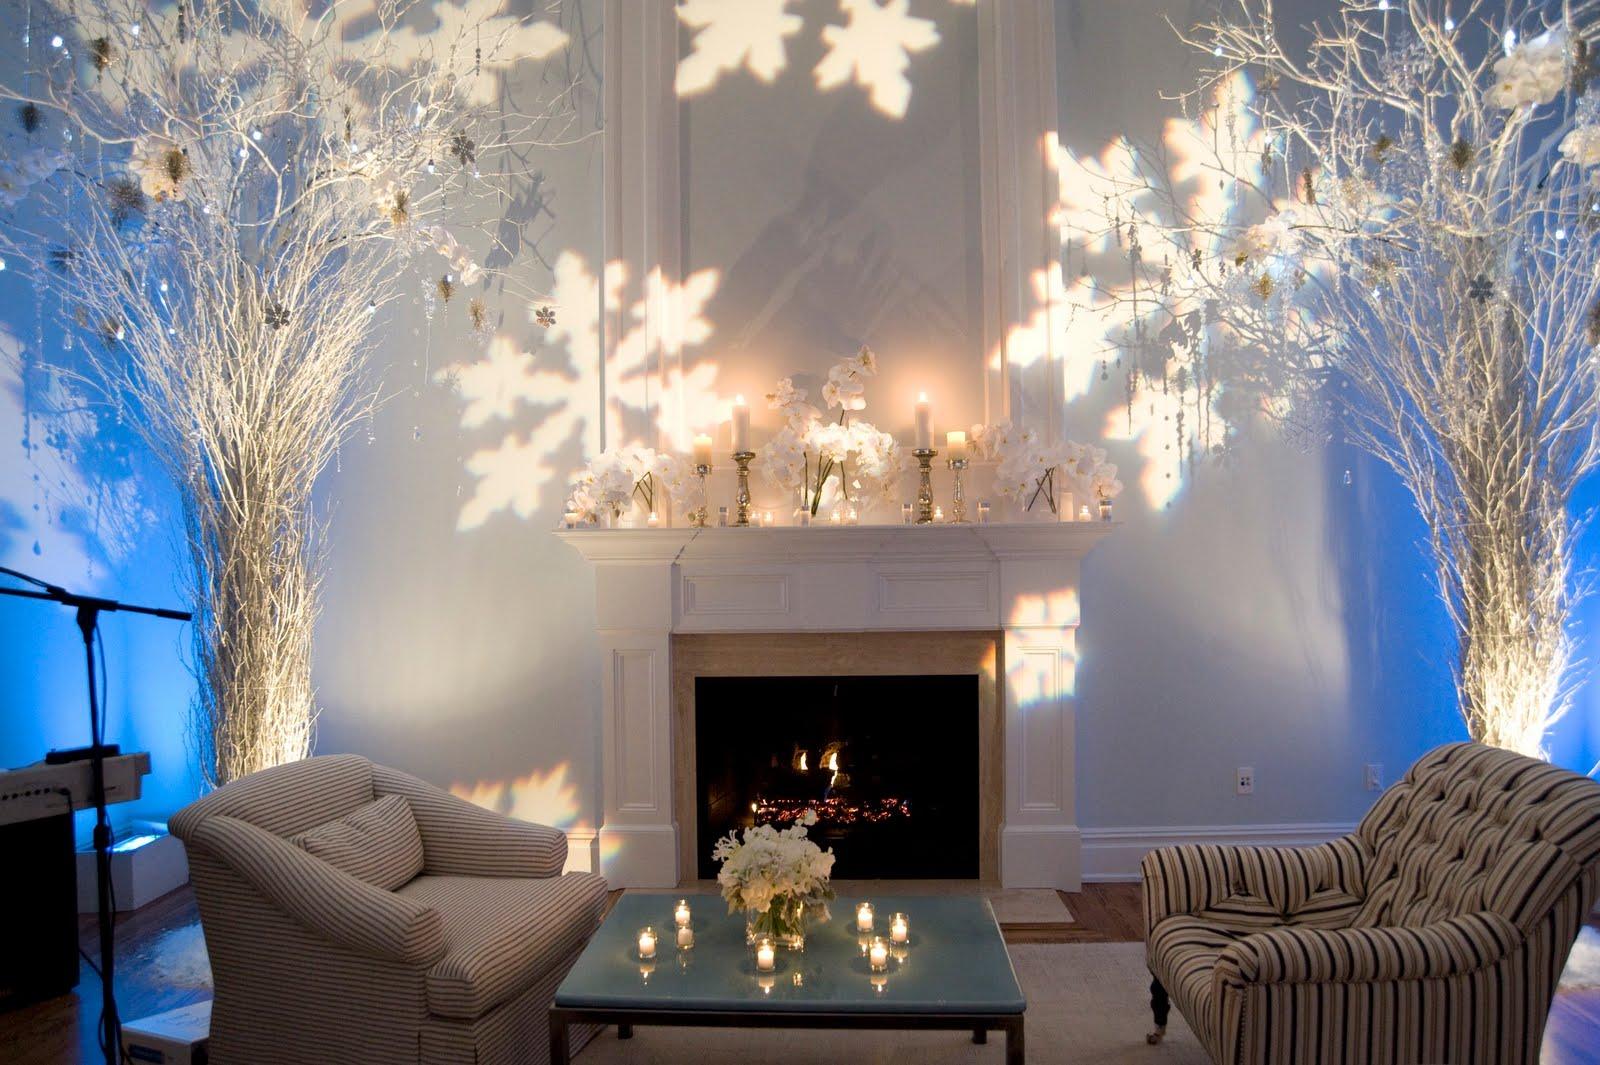 winter wonderland birthday party. Black Bedroom Furniture Sets. Home Design Ideas